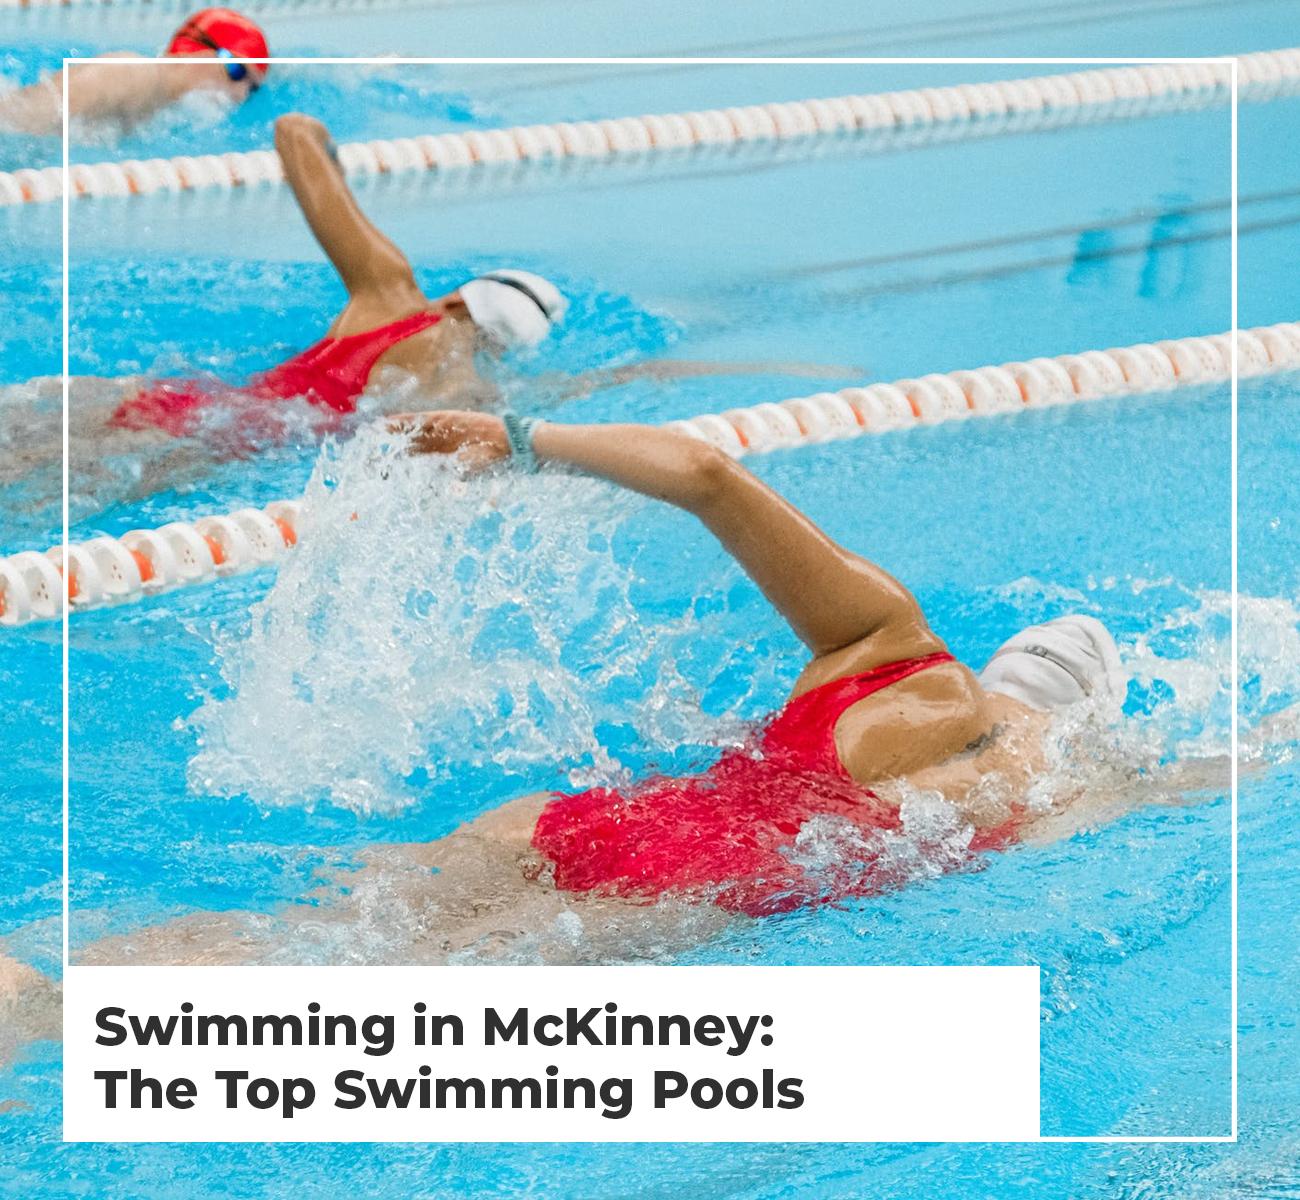 Swimming Pools in McKinney TX